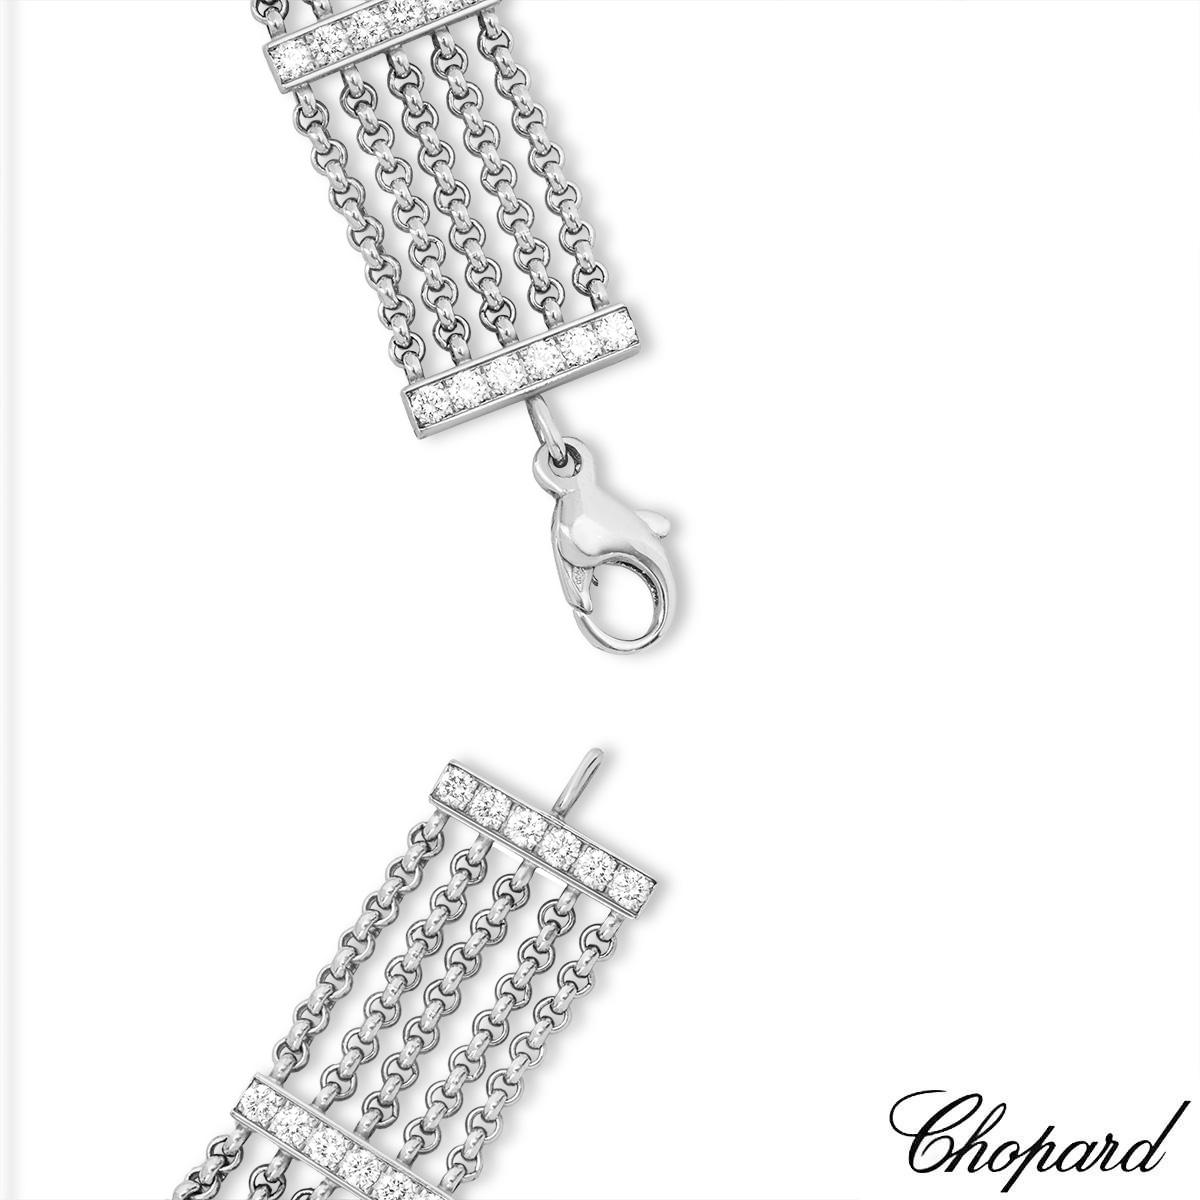 Chopard White Gold Happy Curves Bracelet 85/4831-0